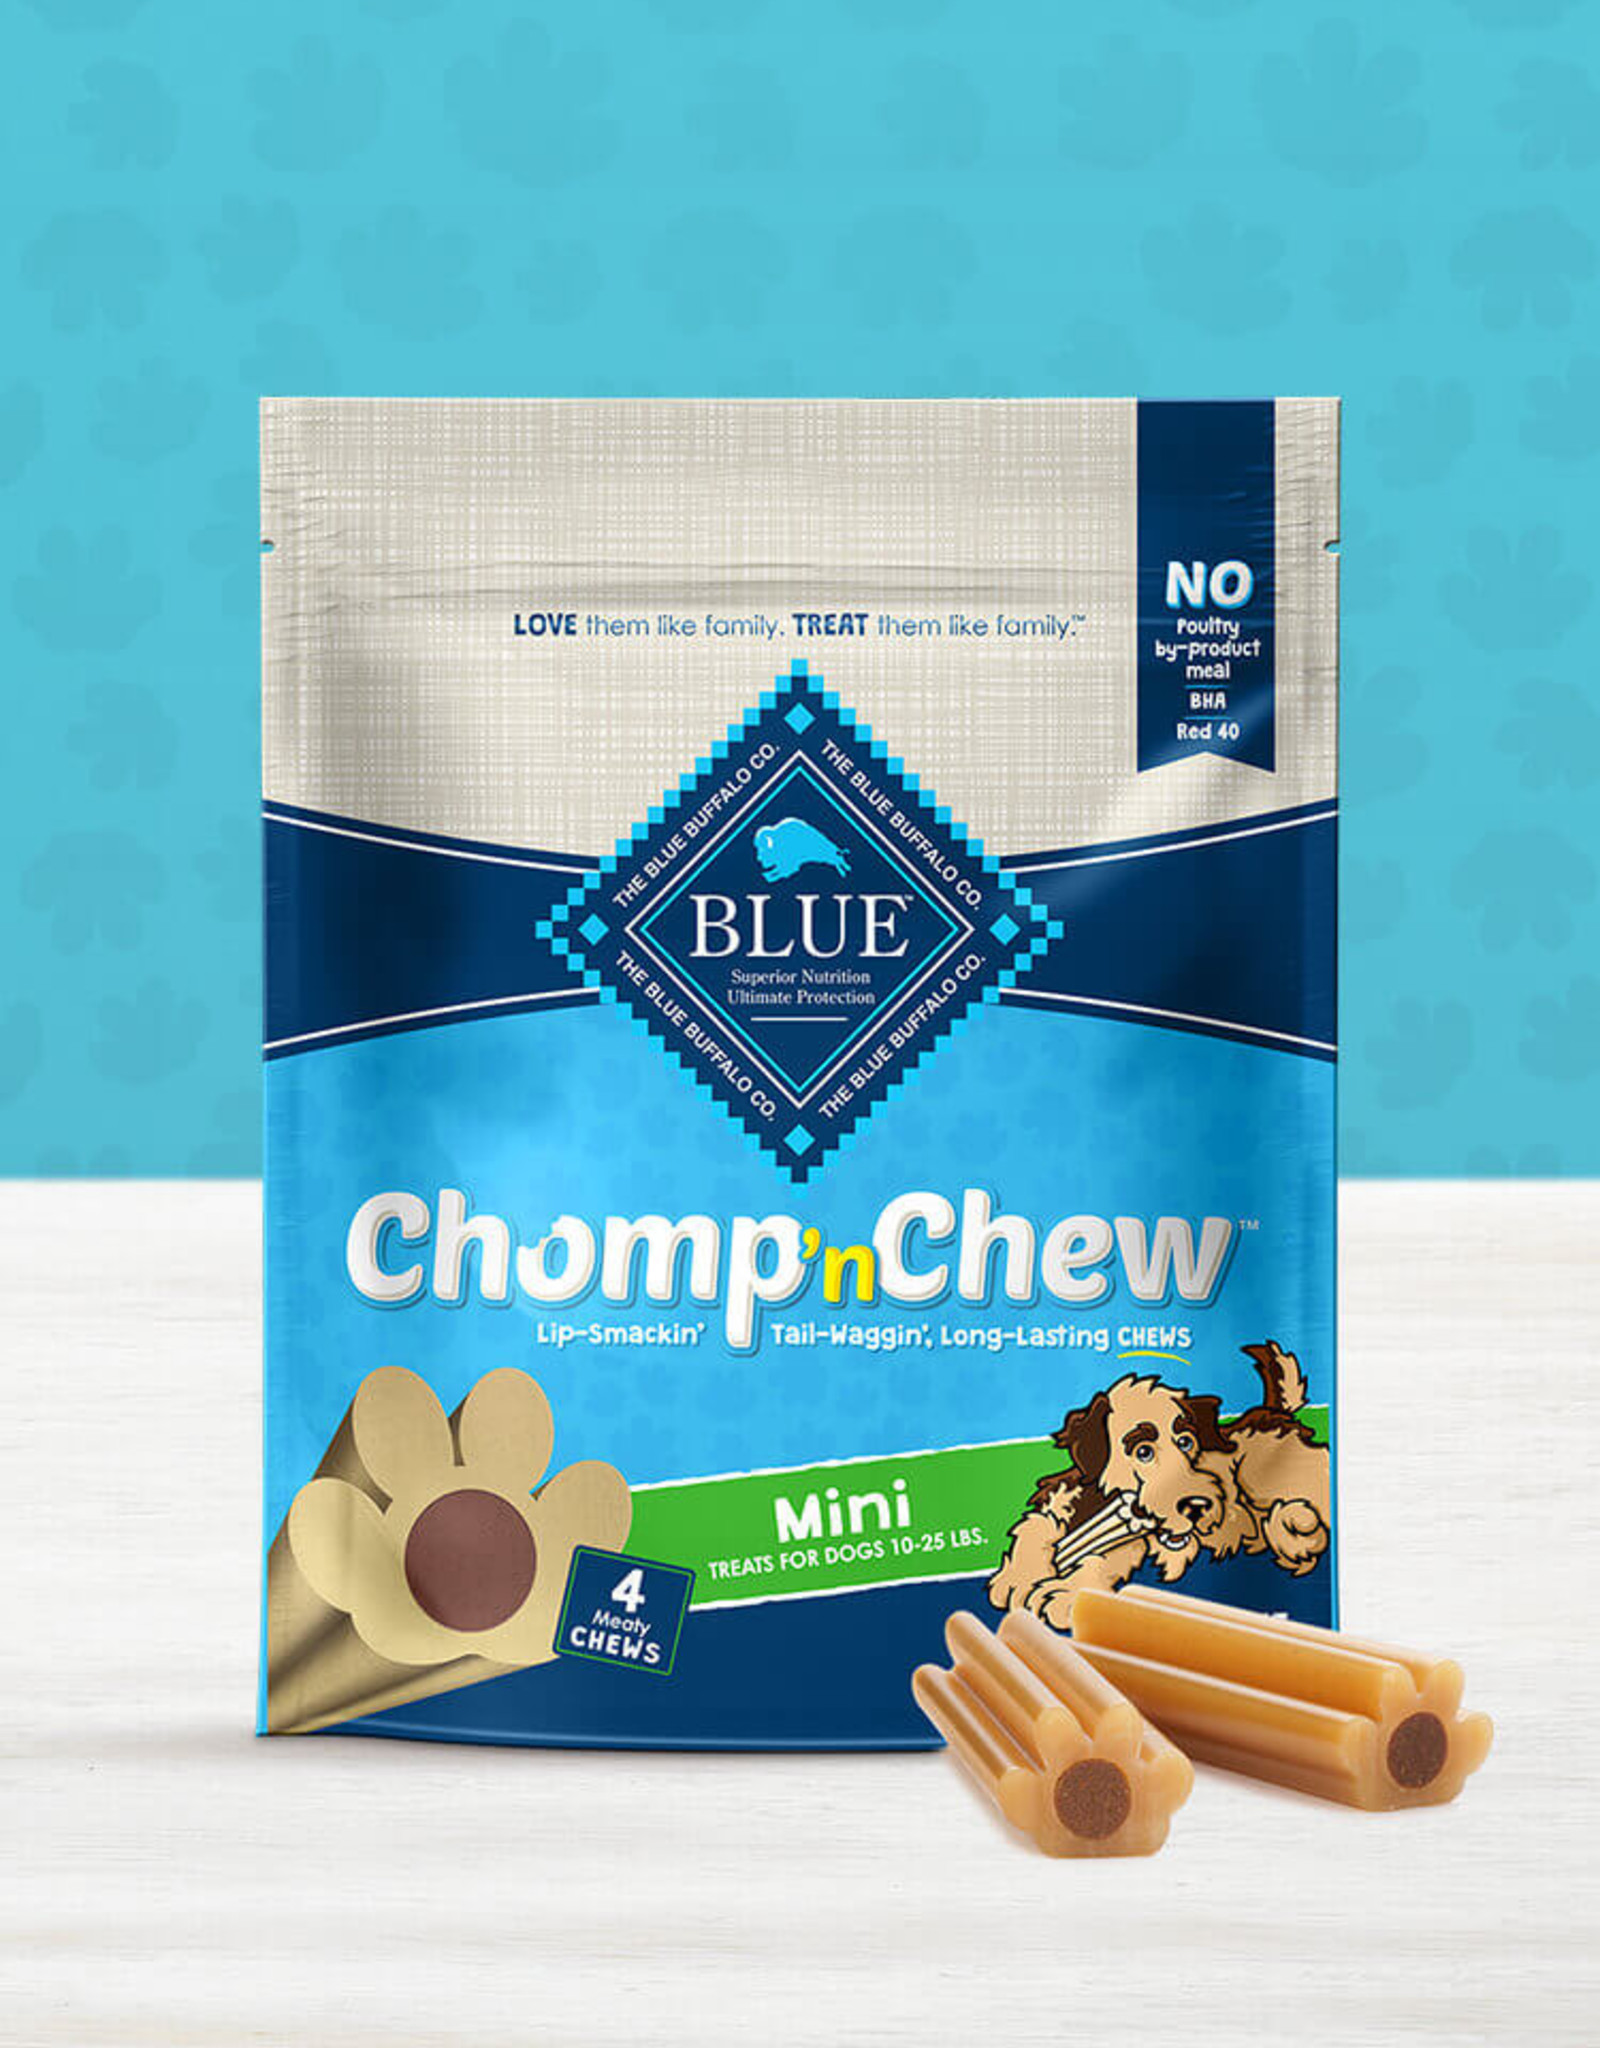 BLUE BUFFALO COMPANY BLUE BUFFALO CHOMP N' CHEW MINI 10CT DISCONTINUED